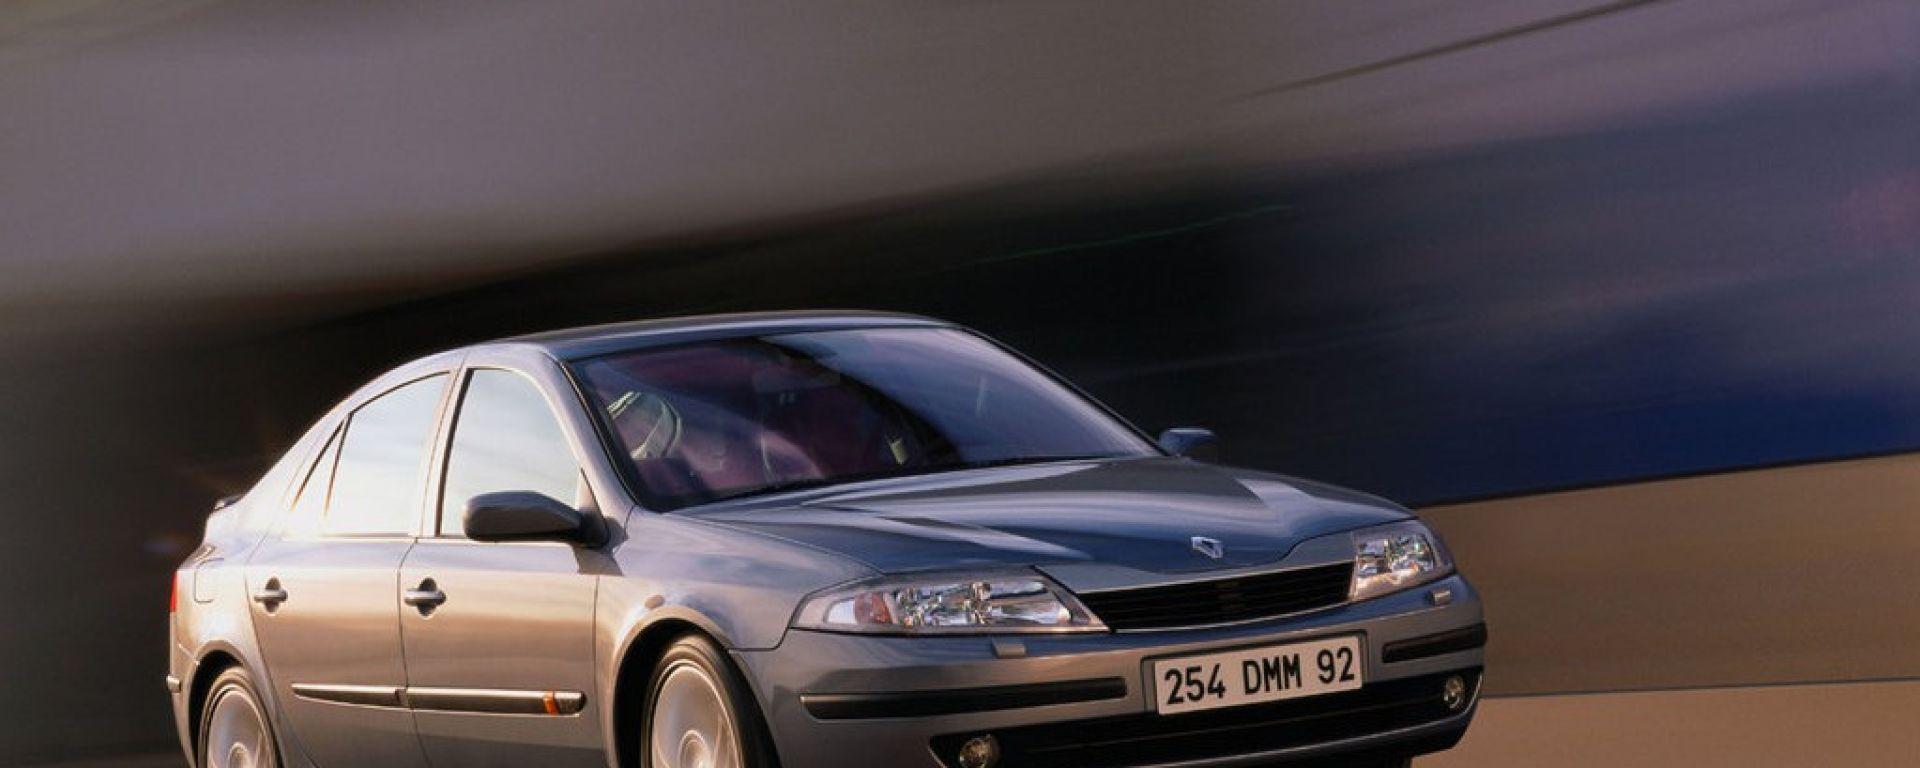 Renault Laguna my 2001